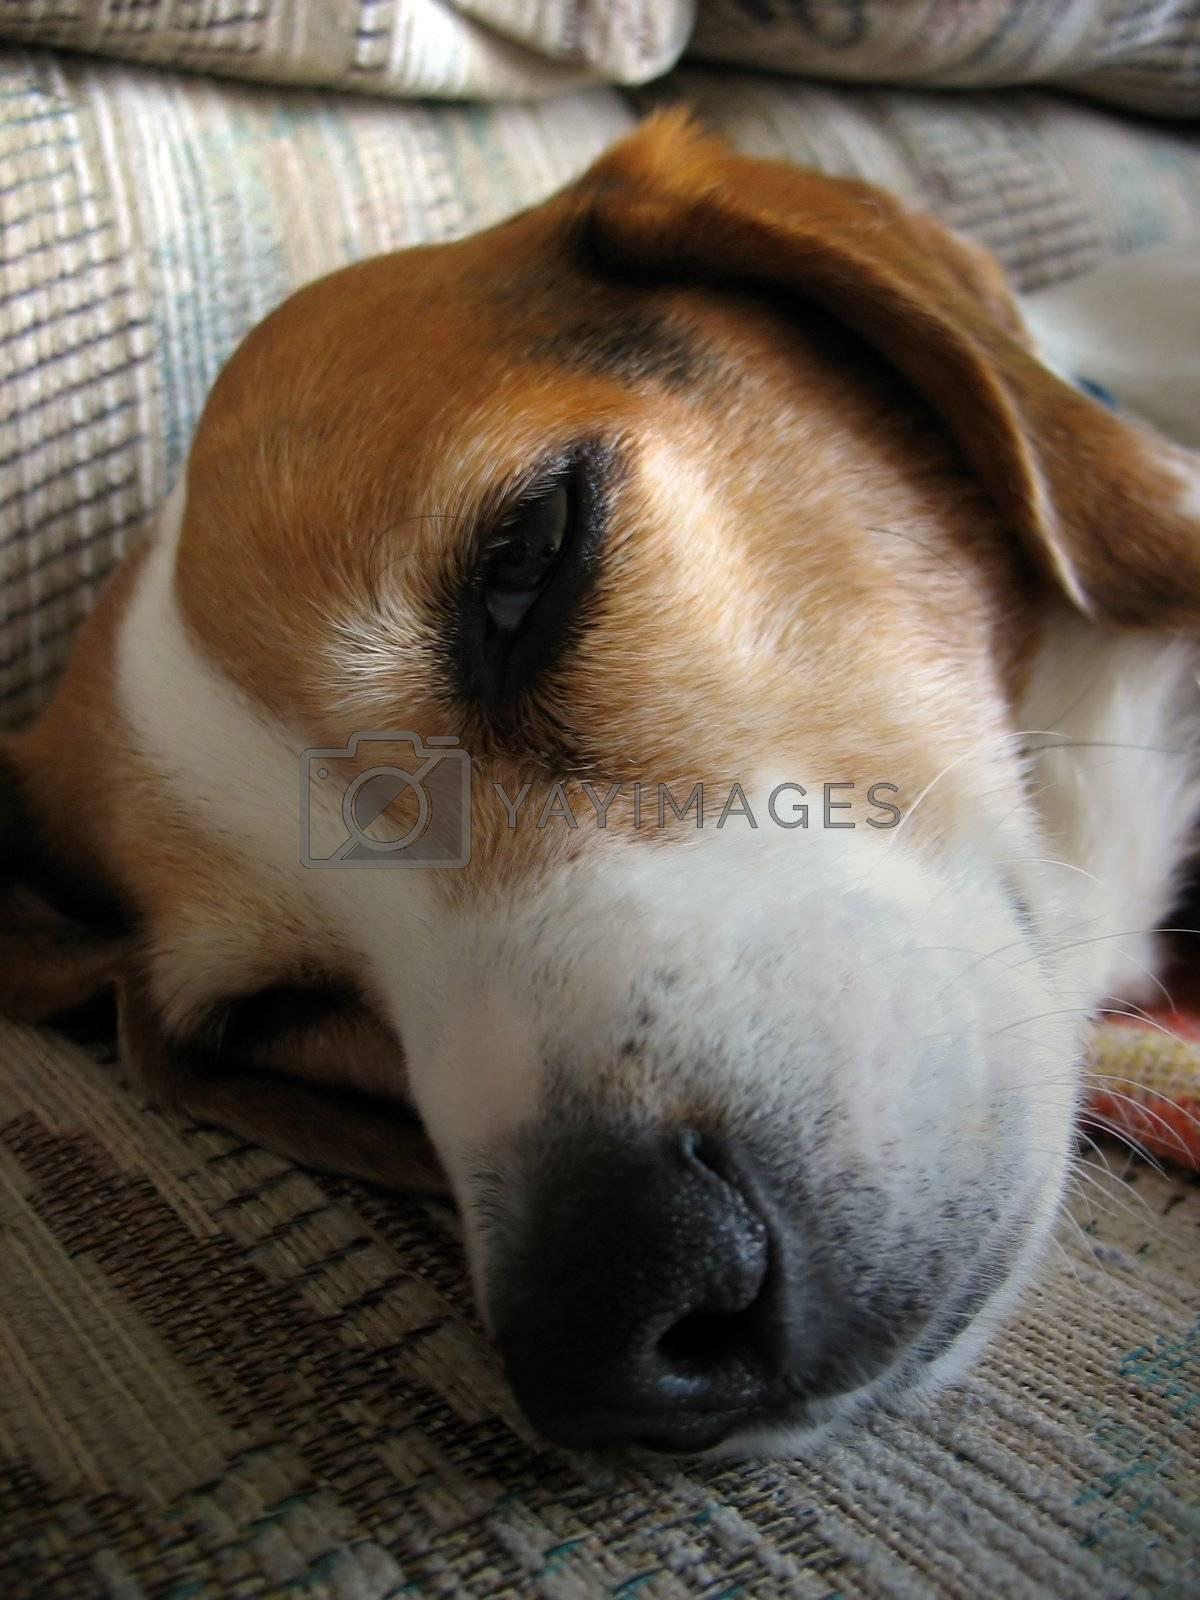 A macro shot of a sleepy beagle dog's nose and face.